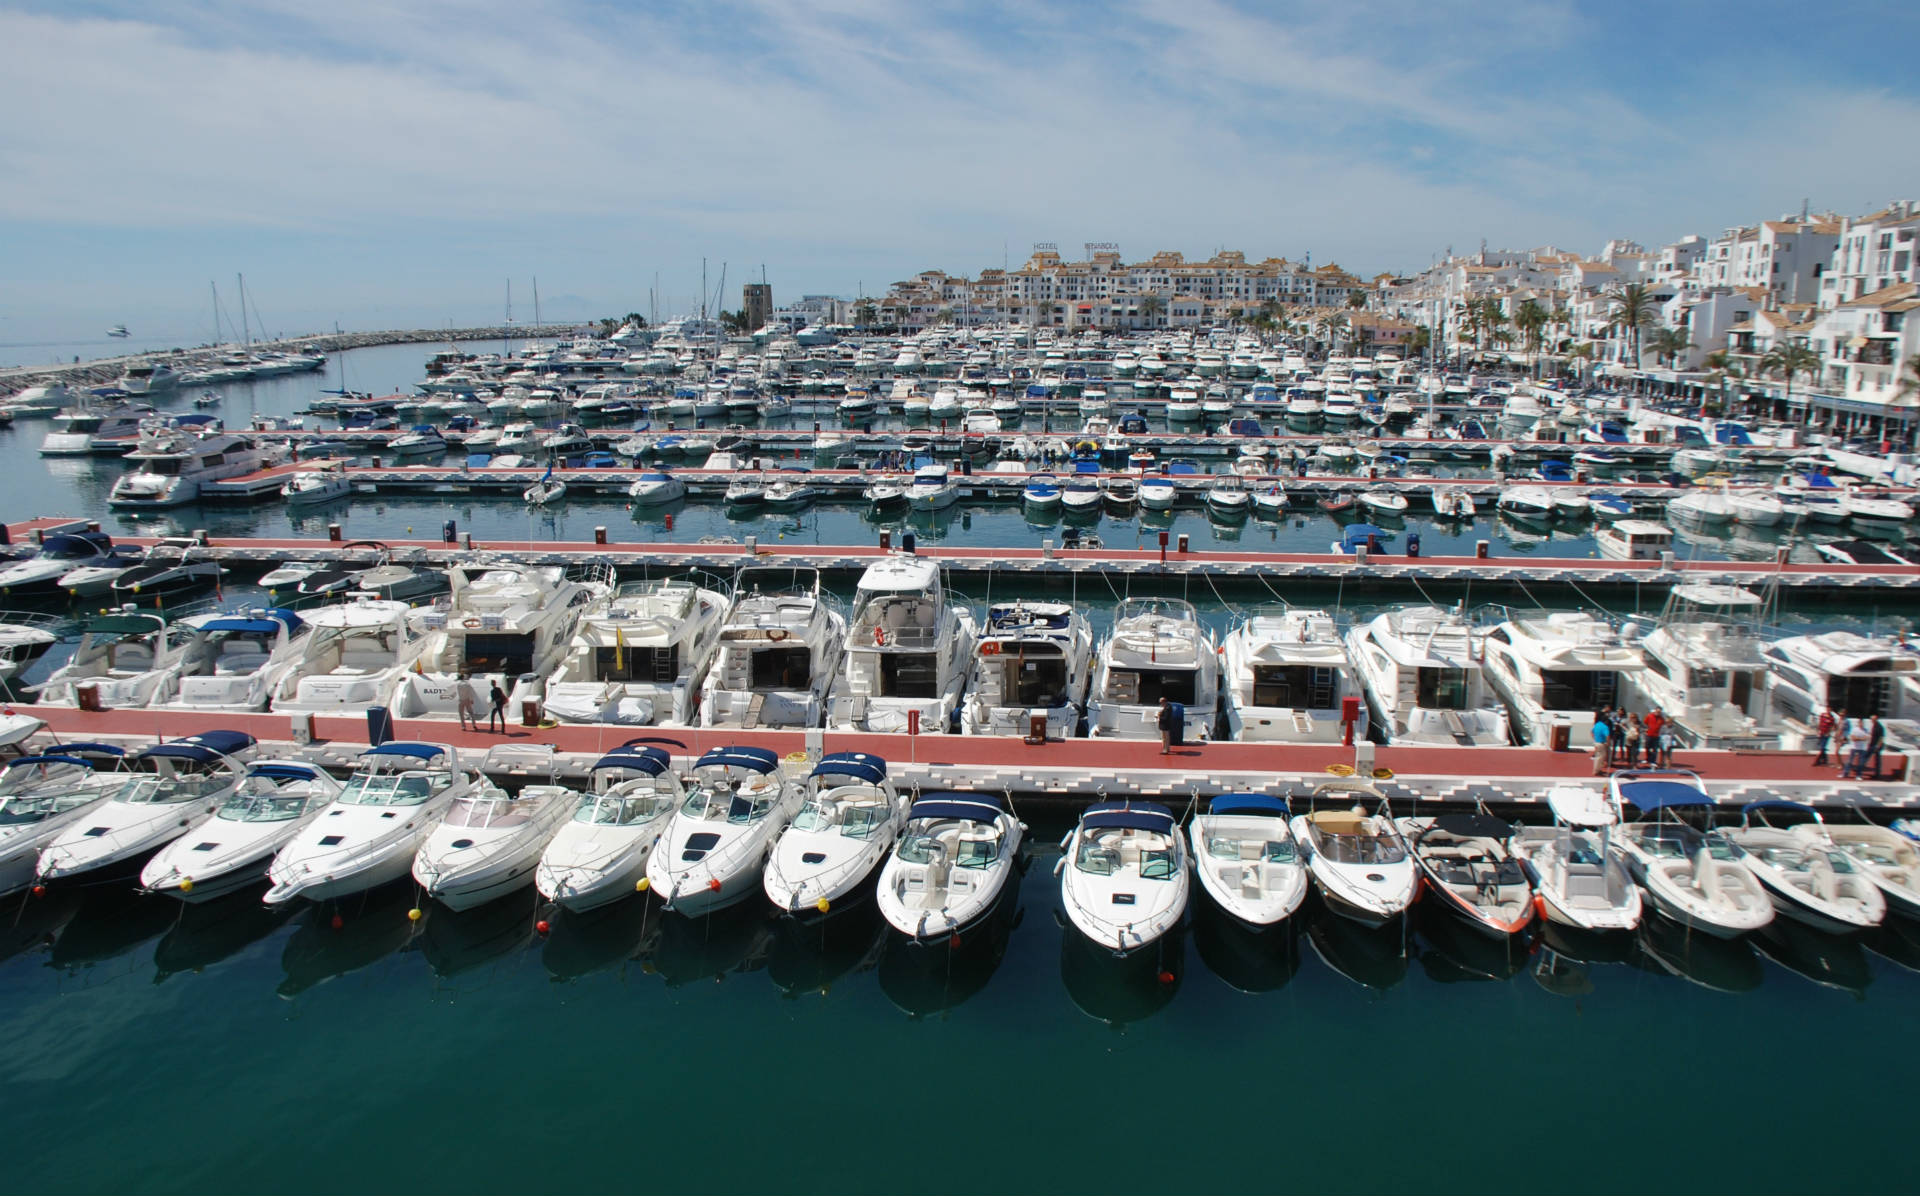 5 000 visitors at boat show in puerto ban s marbella - Puerto banus marbella ...